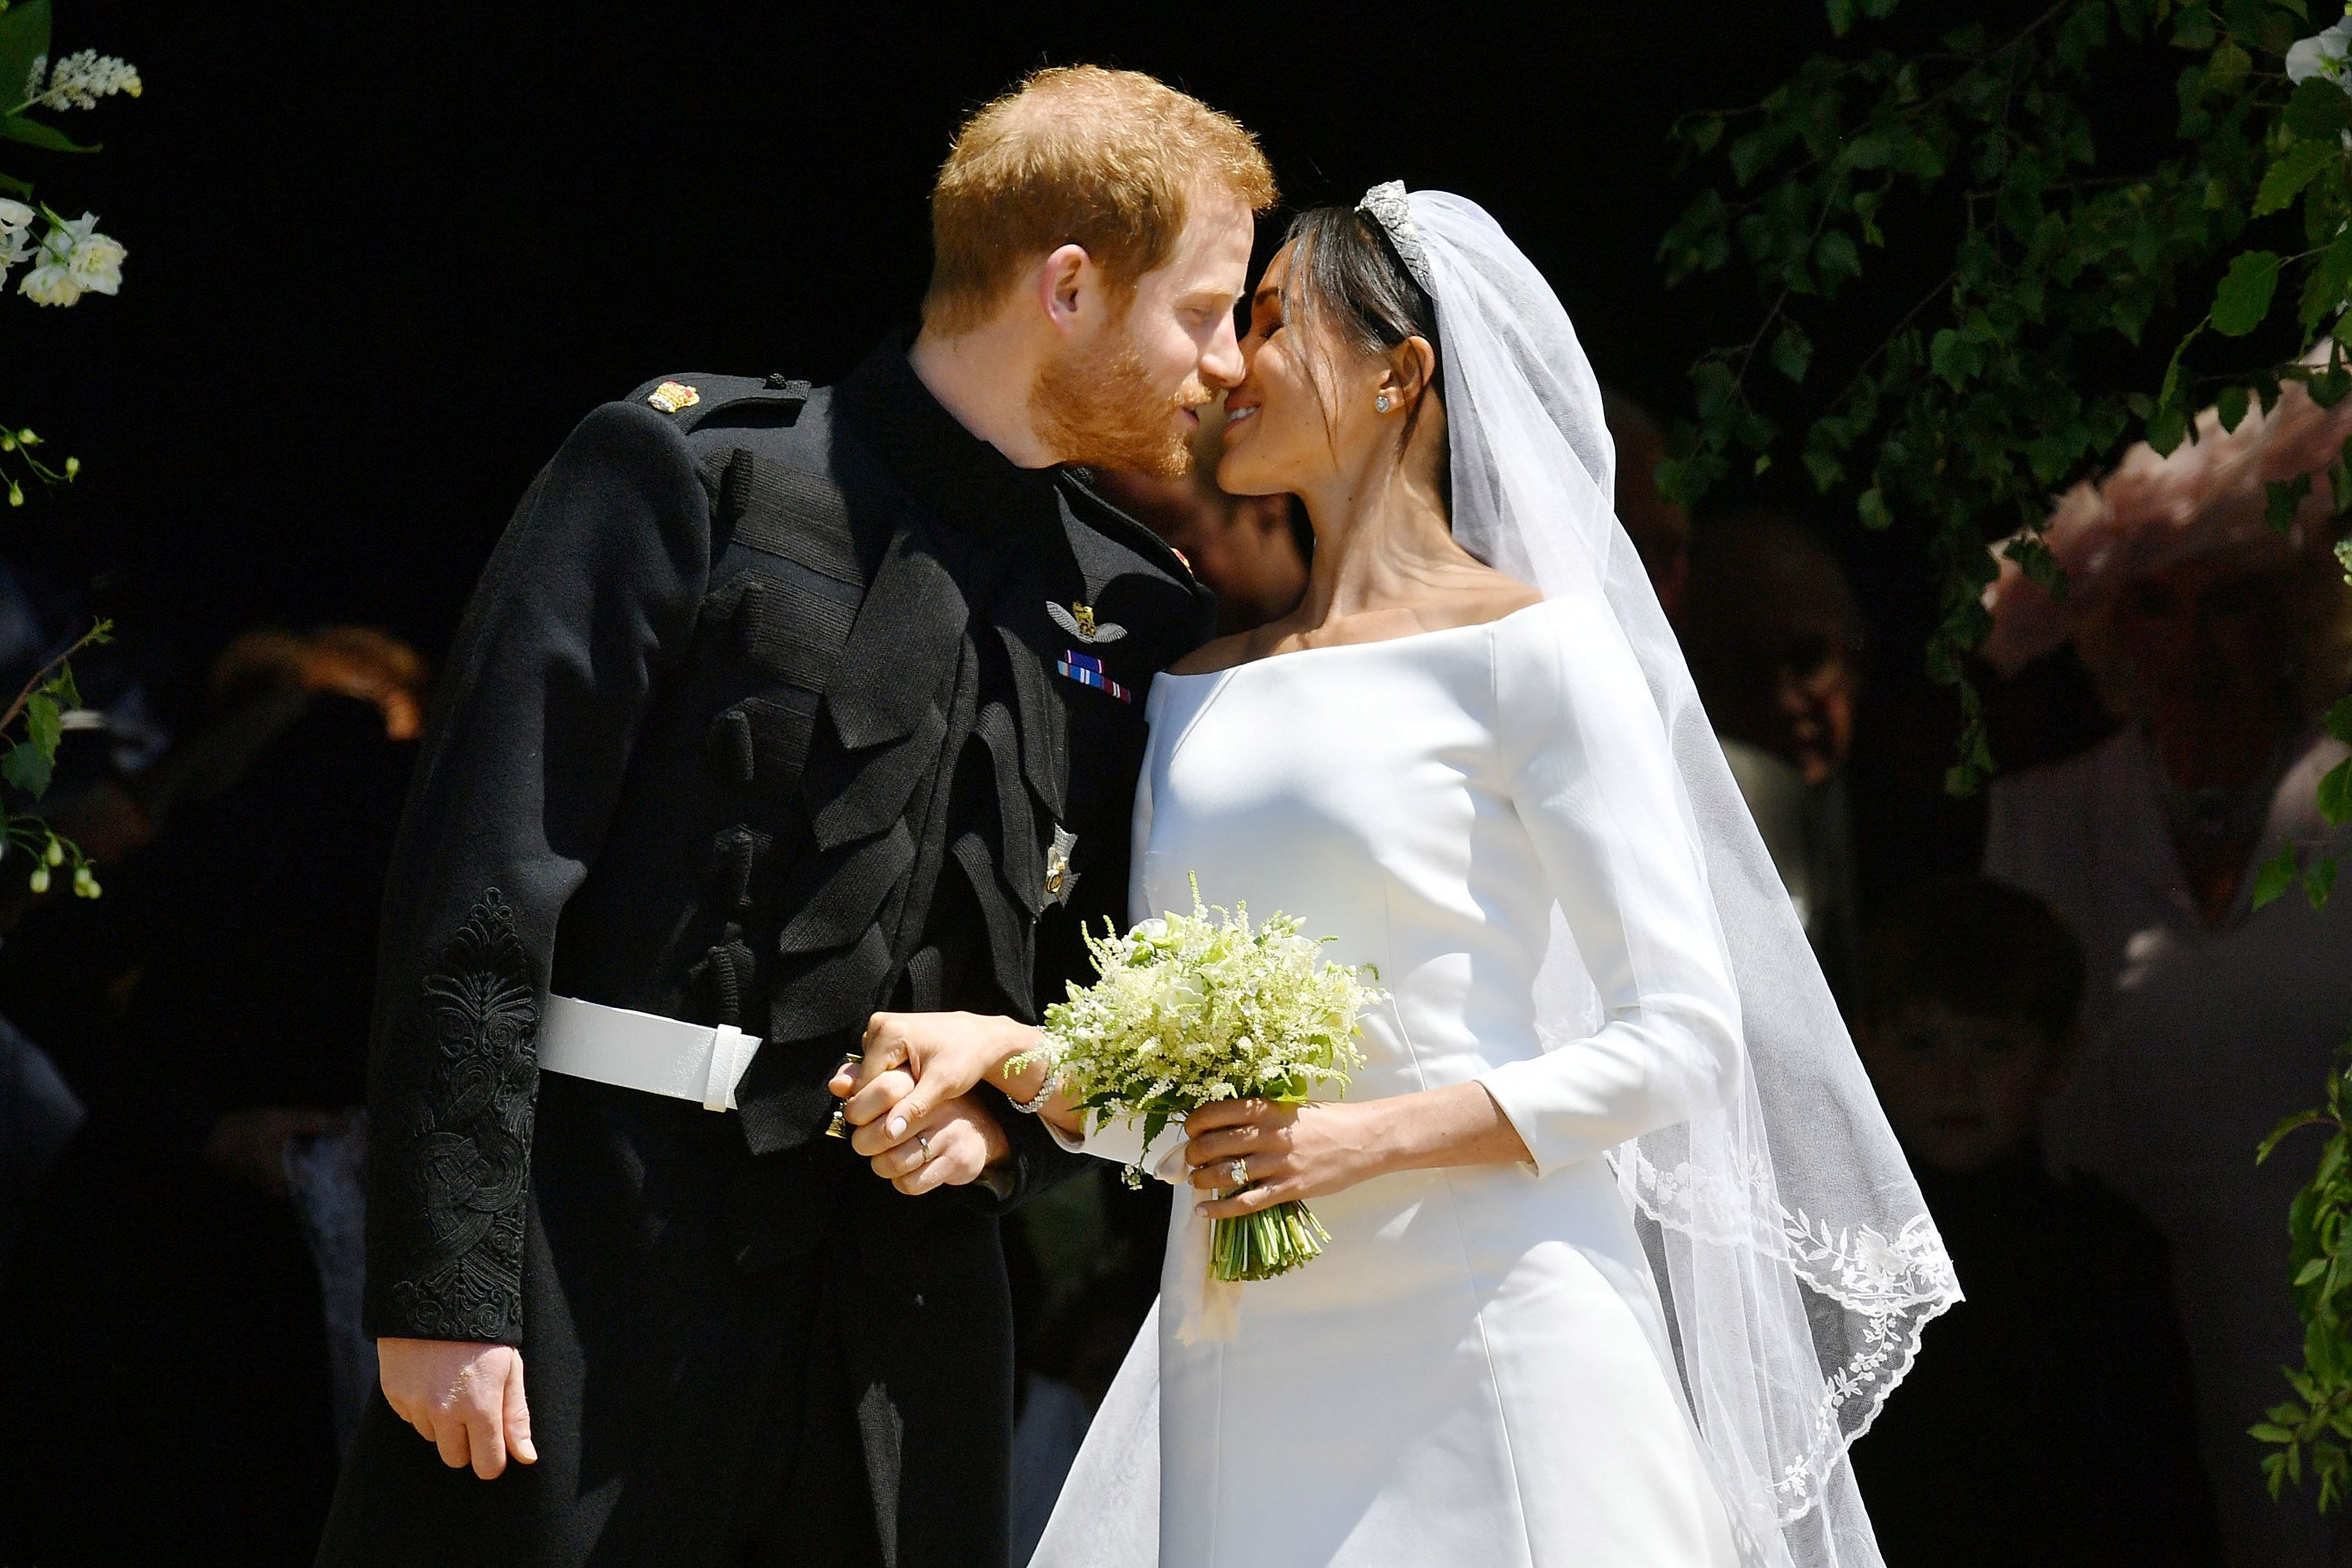 Meghan markle prince harry royal wedding flowers bridal bouquet and meghan markle prince harry royal wedding flowers bridal bouquet and florist guide izmirmasajfo